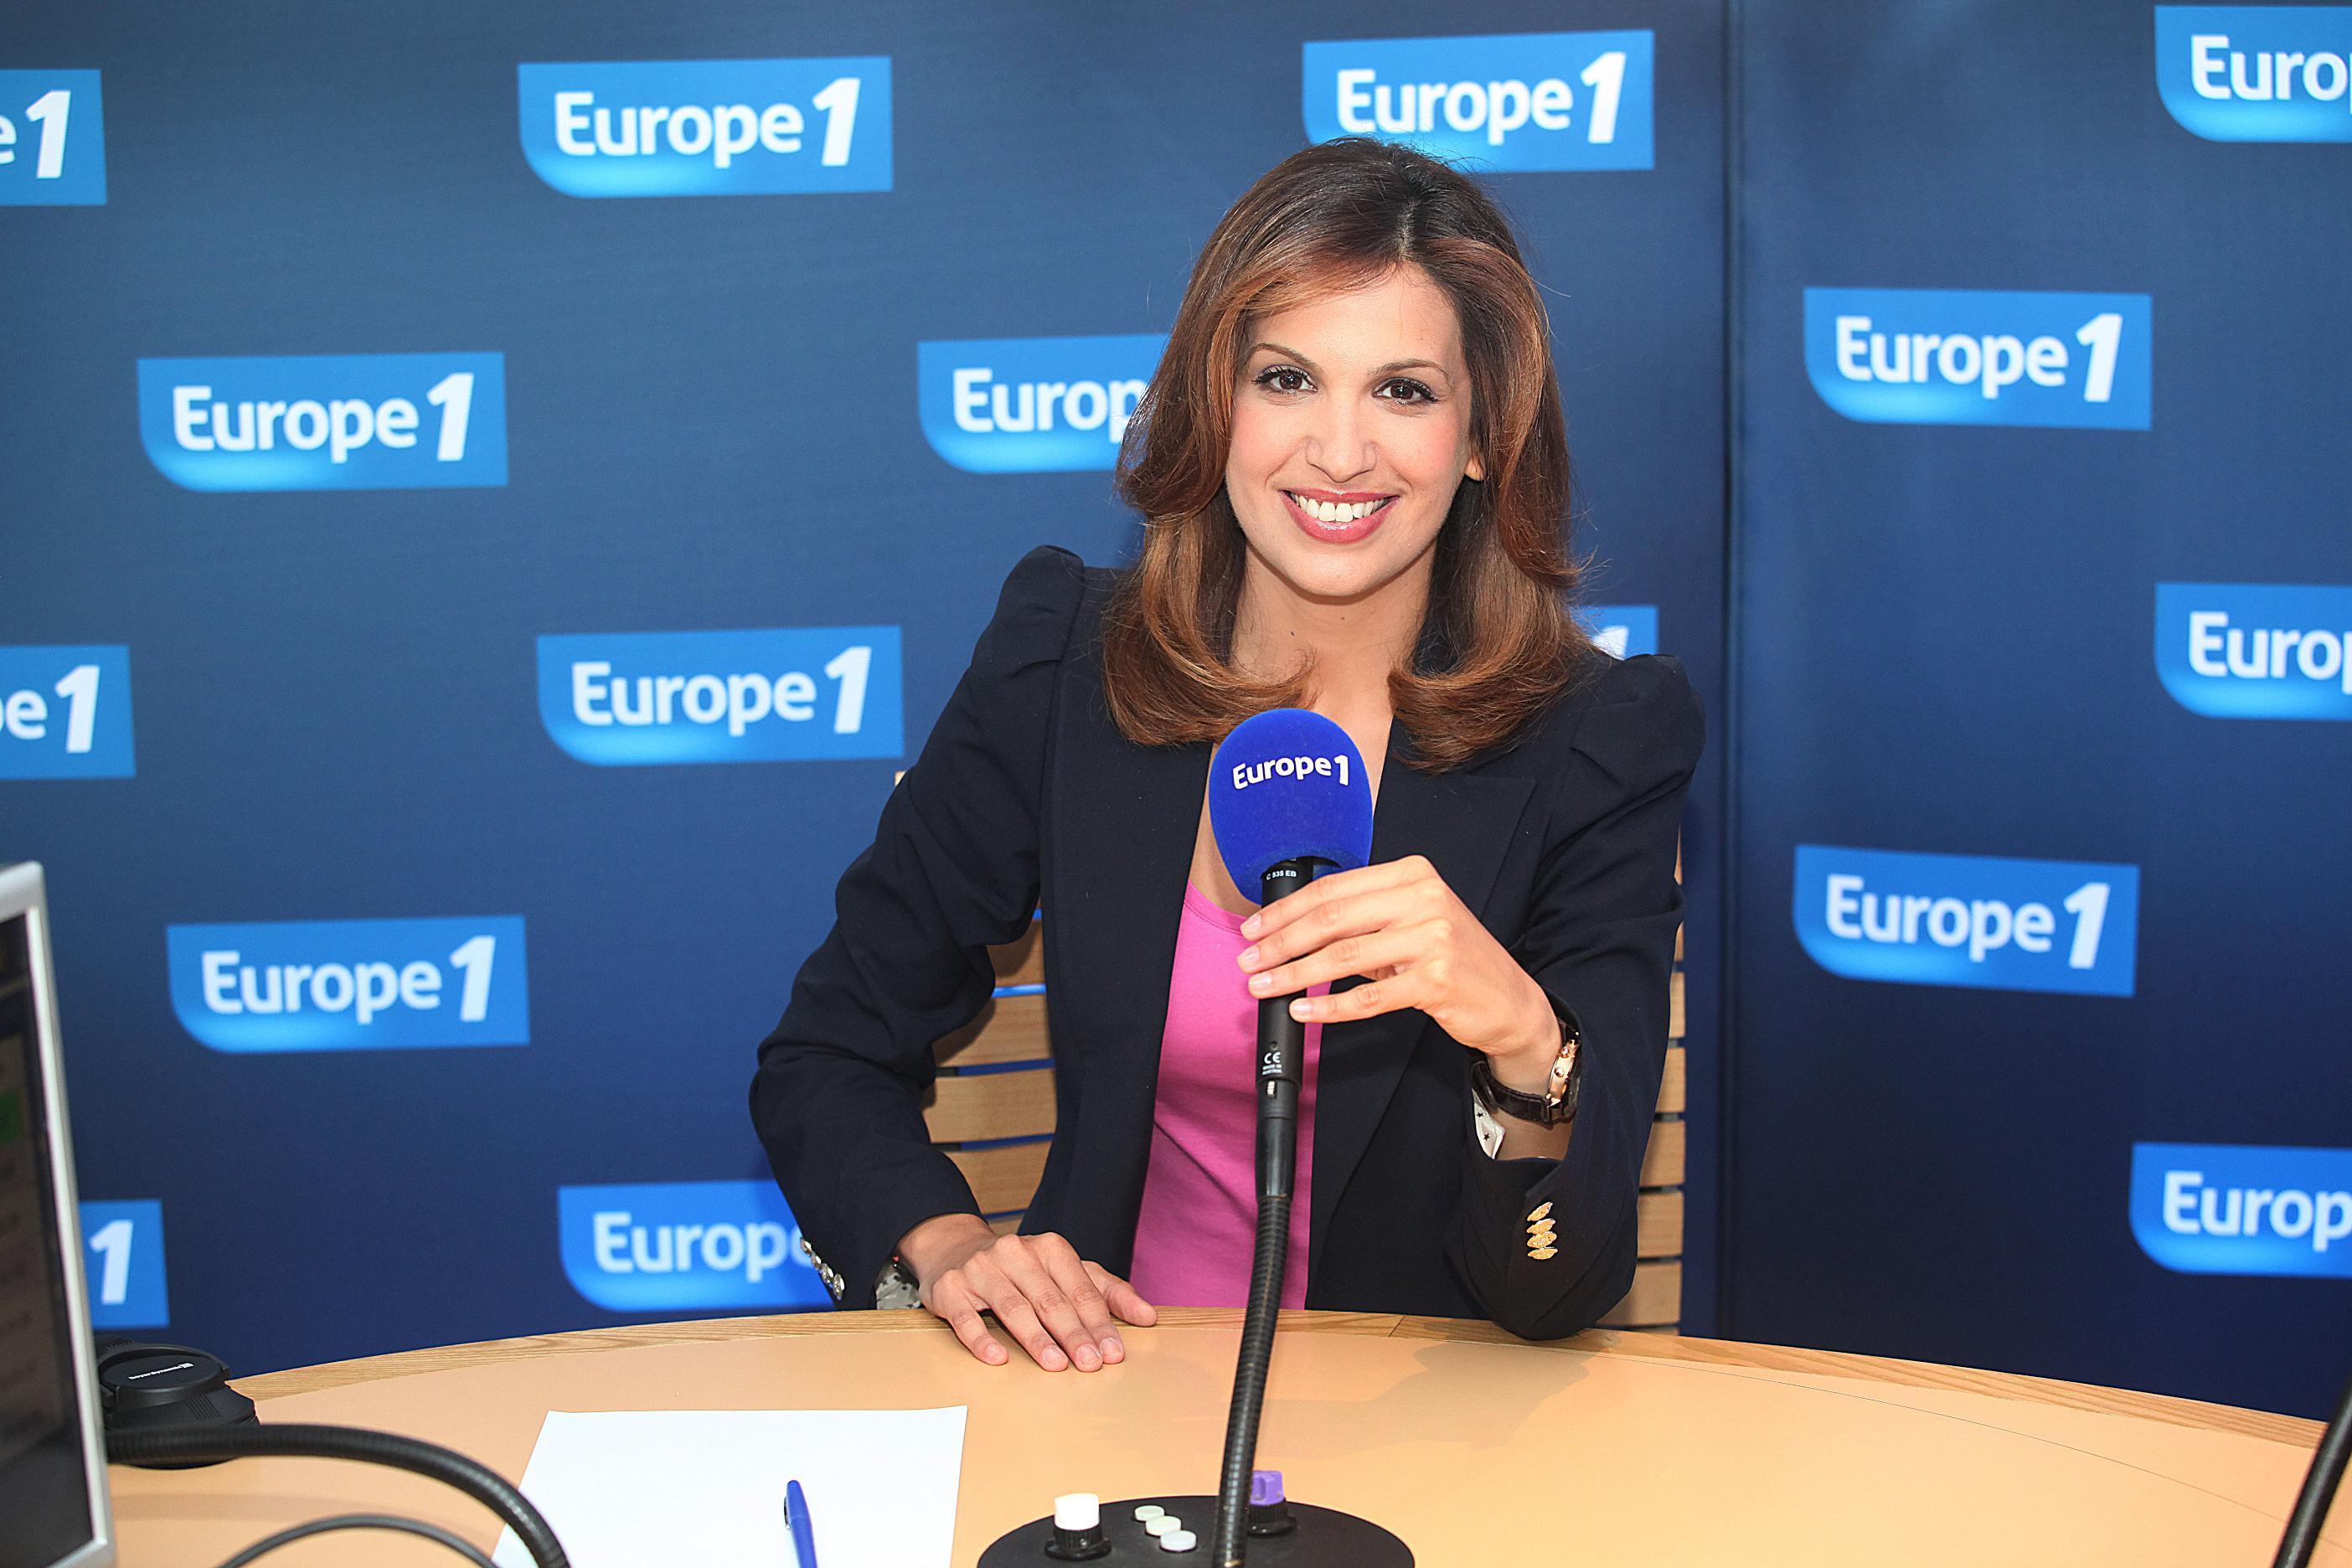 Sonia Mabrouk sera elle aussi à Valmorel ce dimanche © Europe 1 Capa